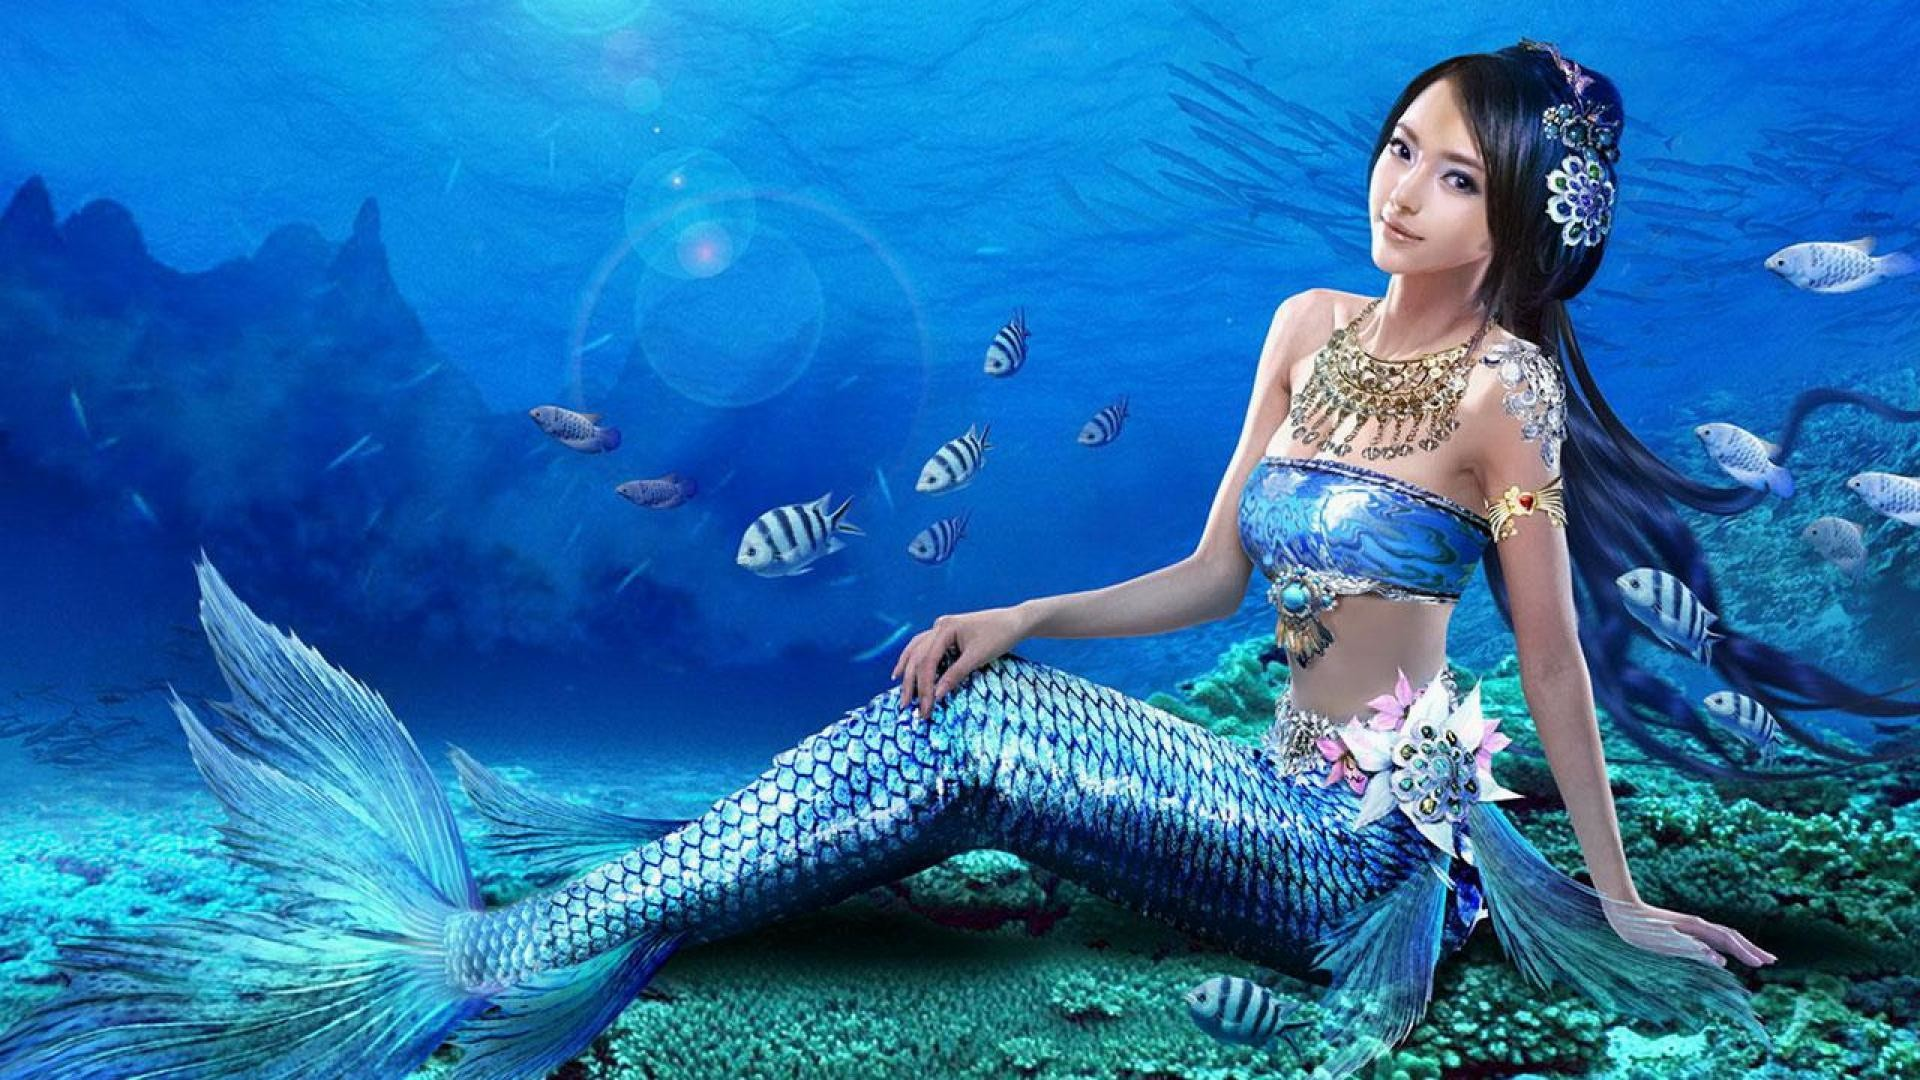 wallpaper.wiki-Mermaid-Wallpaper-HD-For-Desktop-PIC-